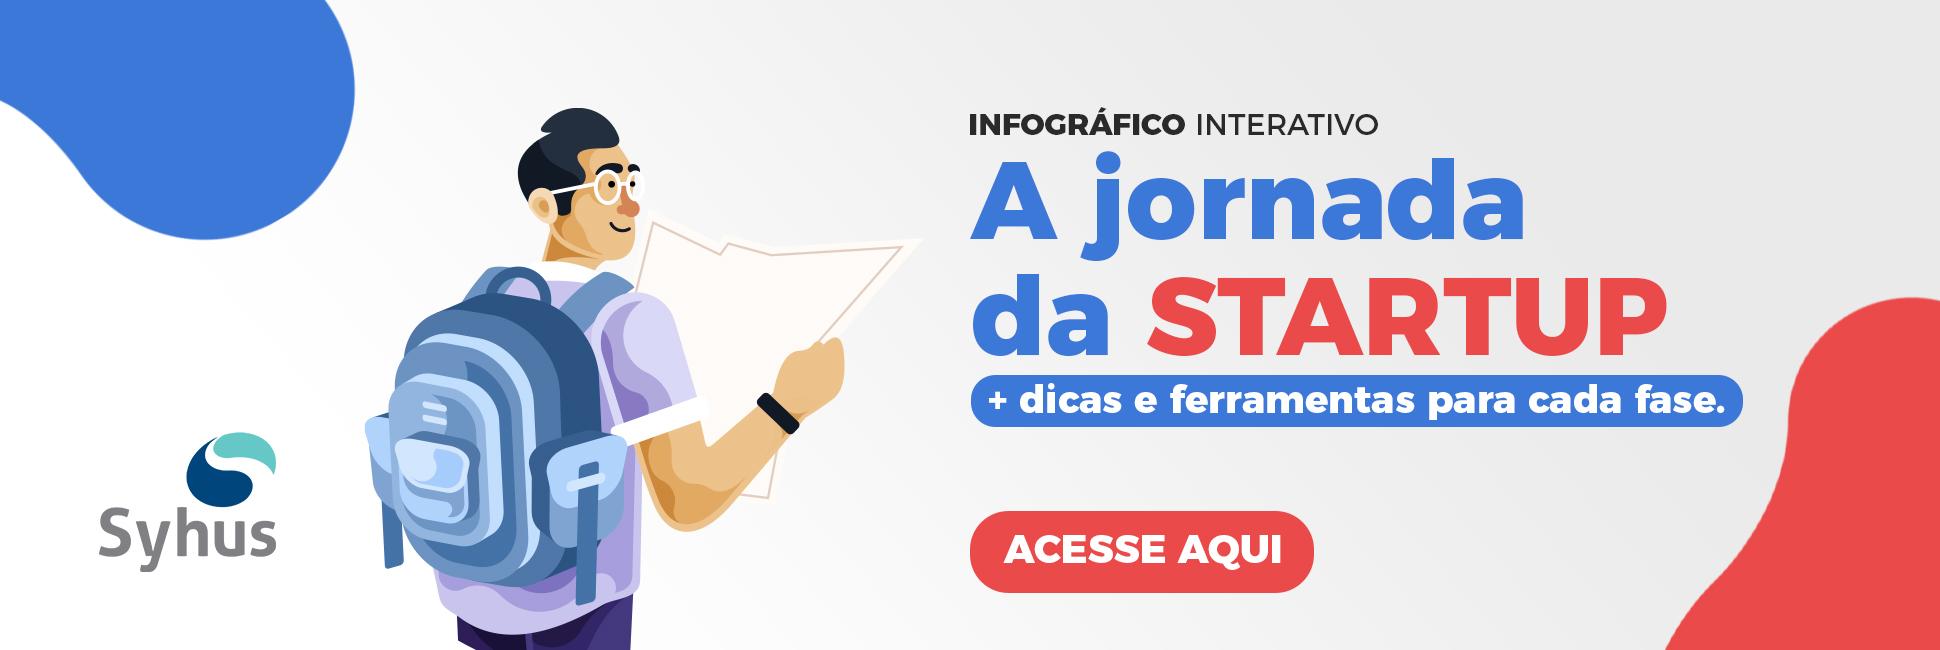 Banner Infográfico A Jornada da Startup